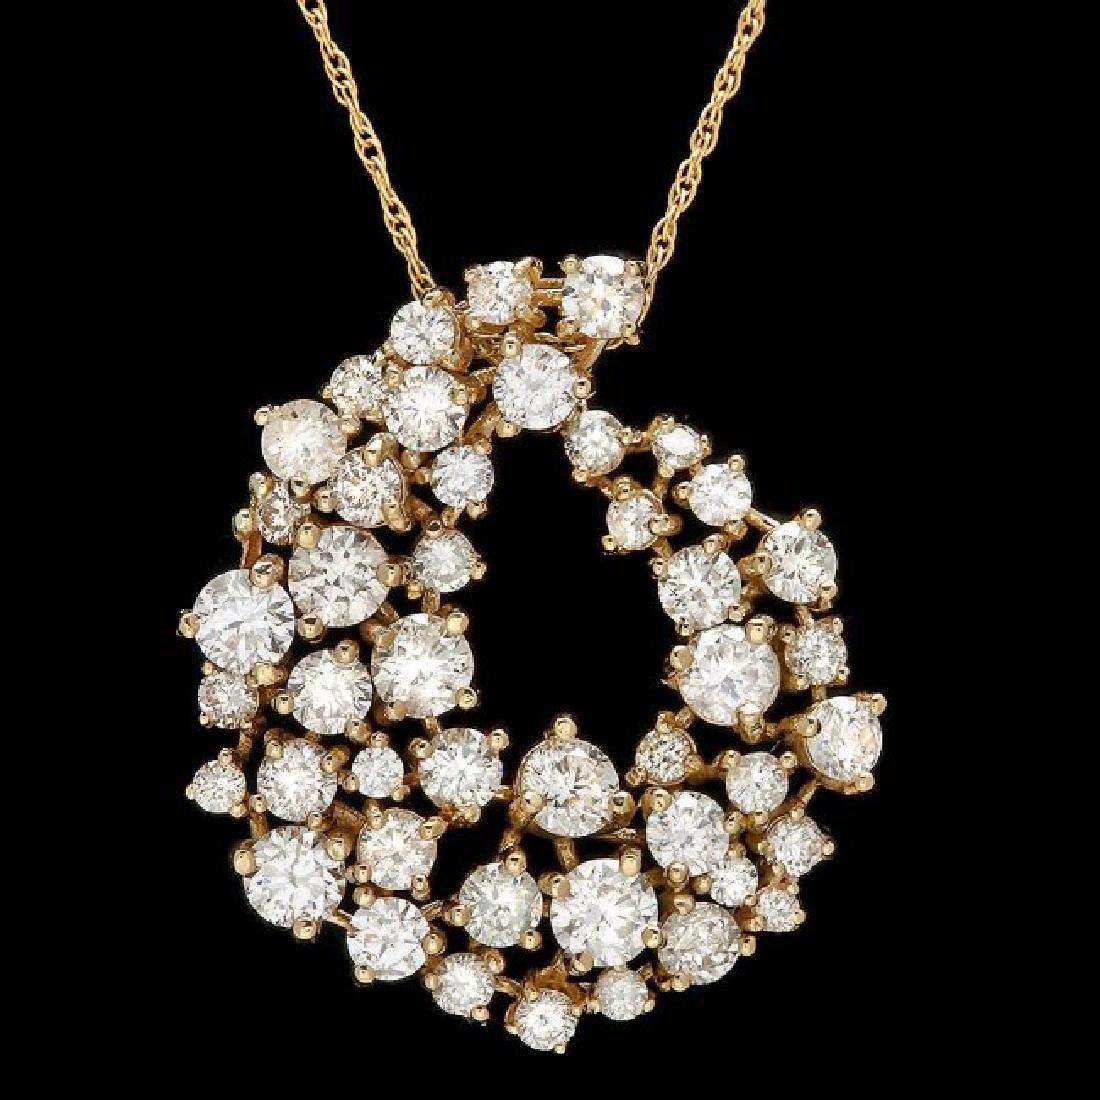 14k Yellow Gold 2.70ct Diamond Pendant